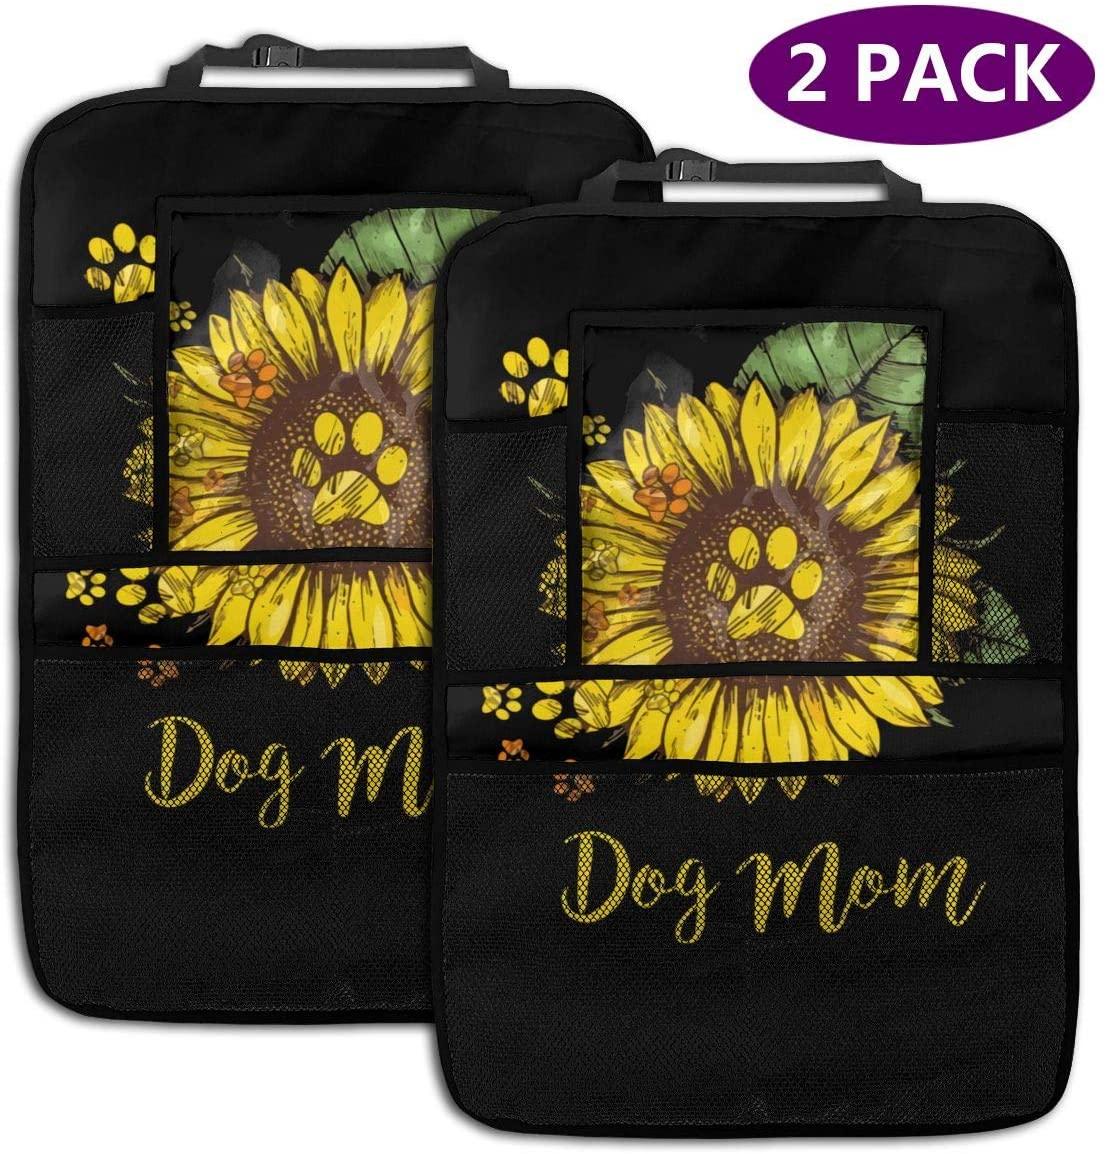 Backseat Car Organizer Dog Mom - Sunflower Seamless Vector Background 2 Pack Car Seat Organizer Waterproof Durable Multi Pocket Back Seat Storage Bag Travel Accessories